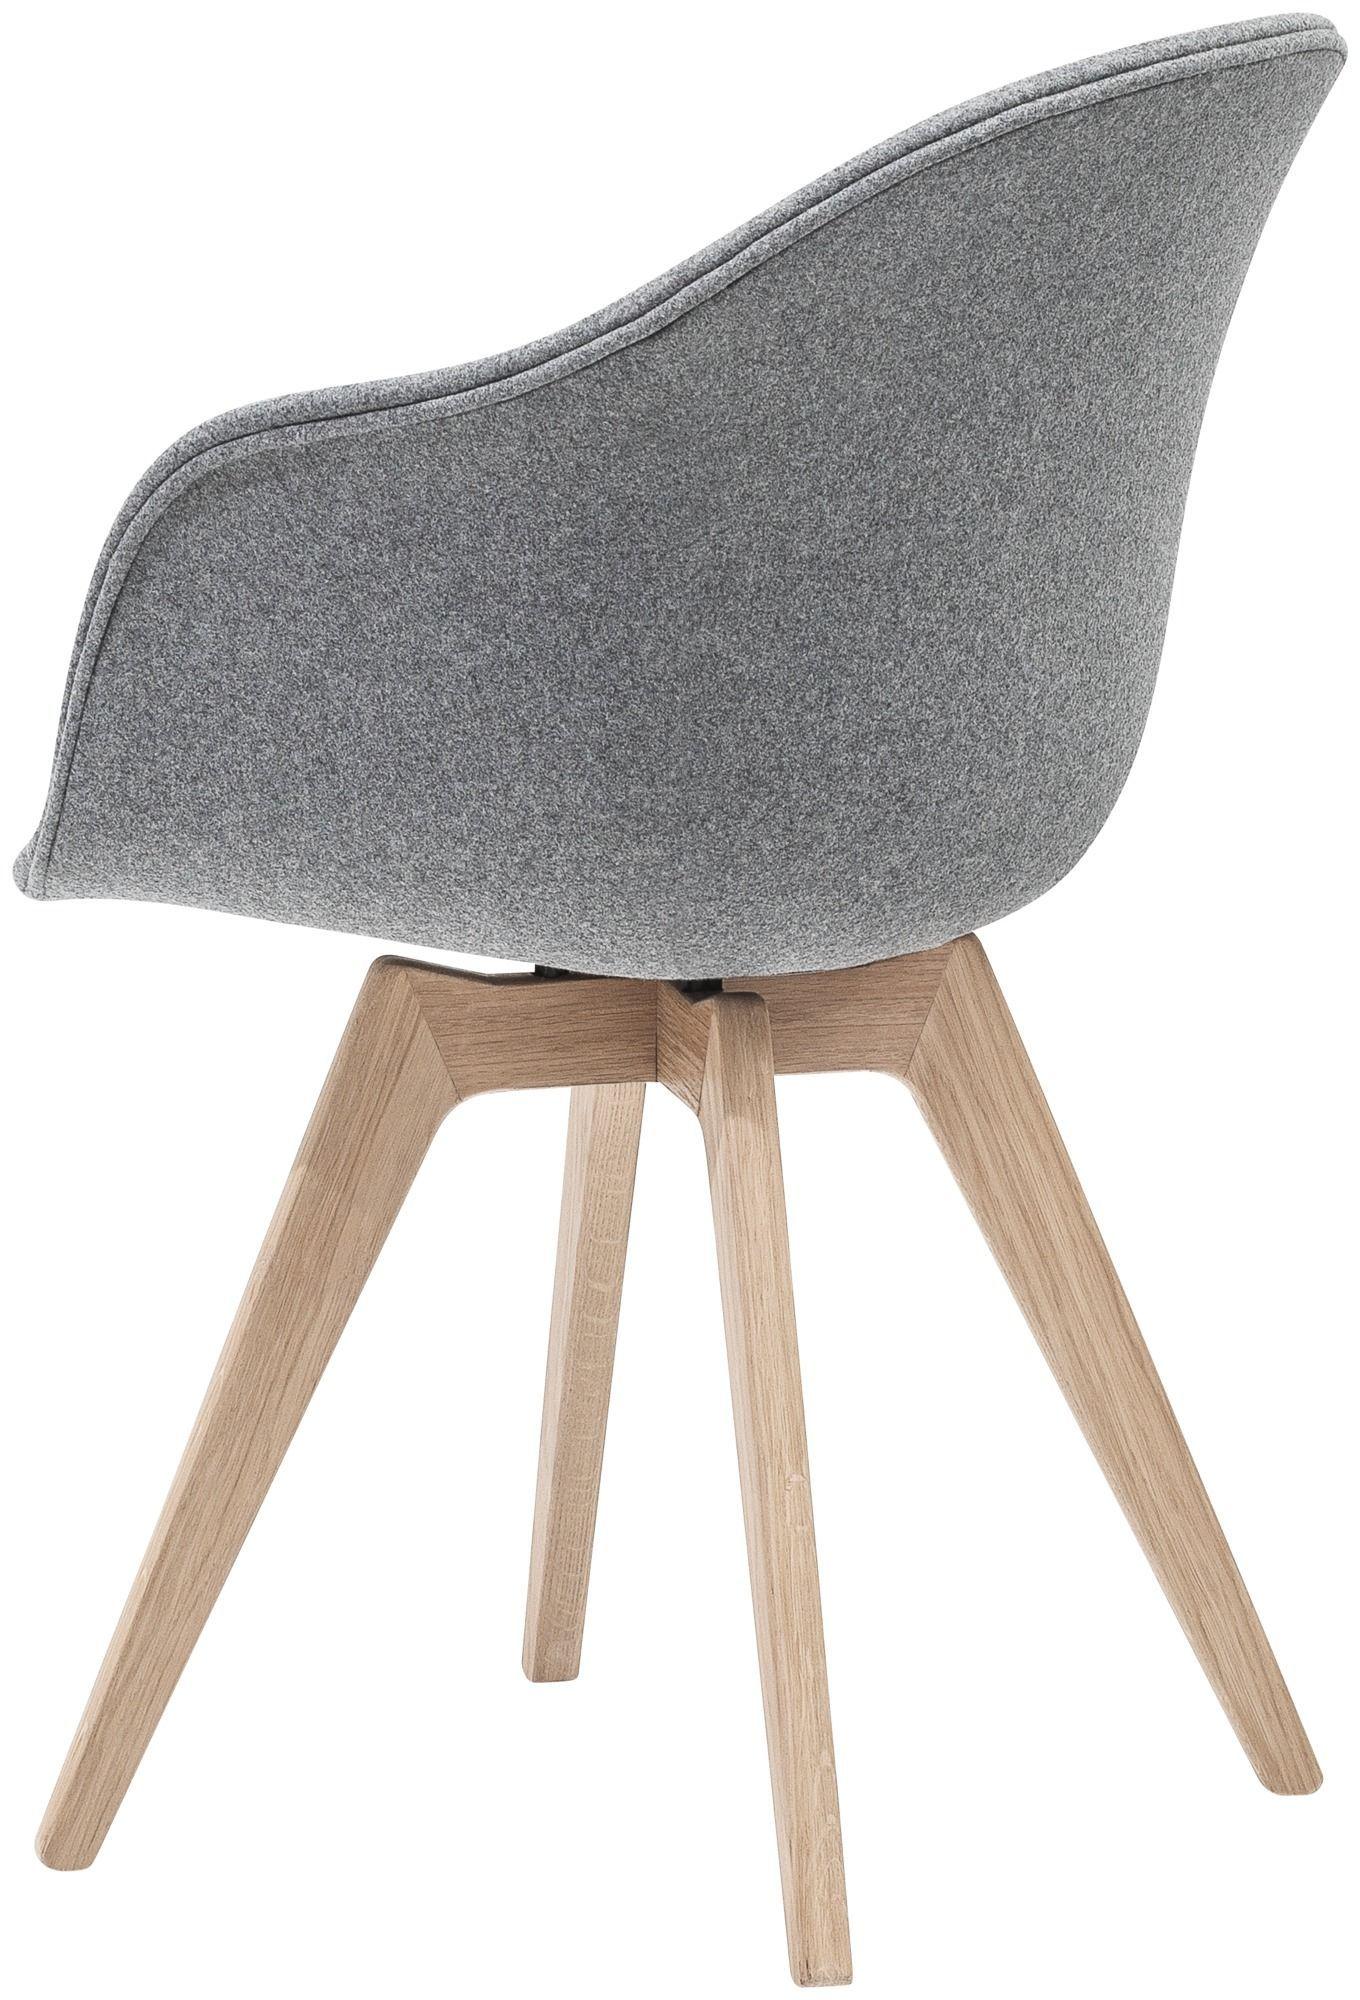 Modern Dining Chairs Online Ad 1 Moderne Esszimmerstuhle Online